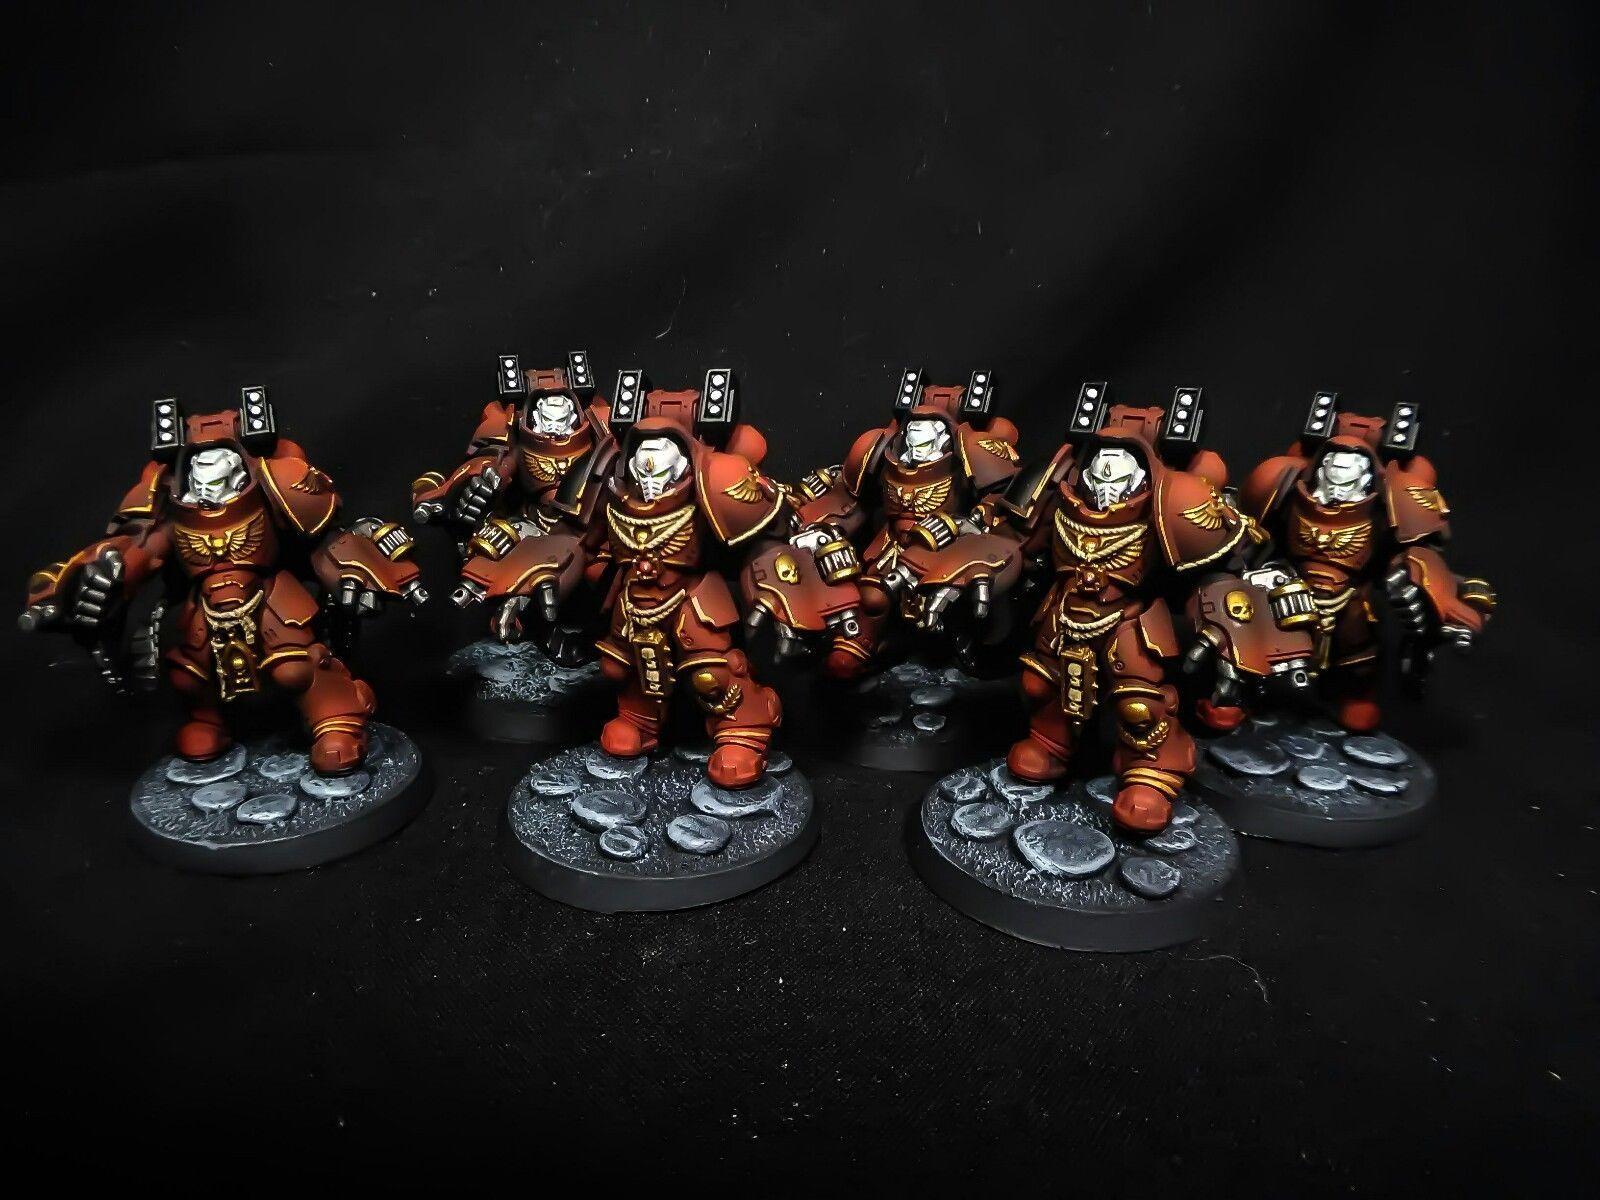 Details about Warhammer 40k Blood Angels Sternguard Veteran